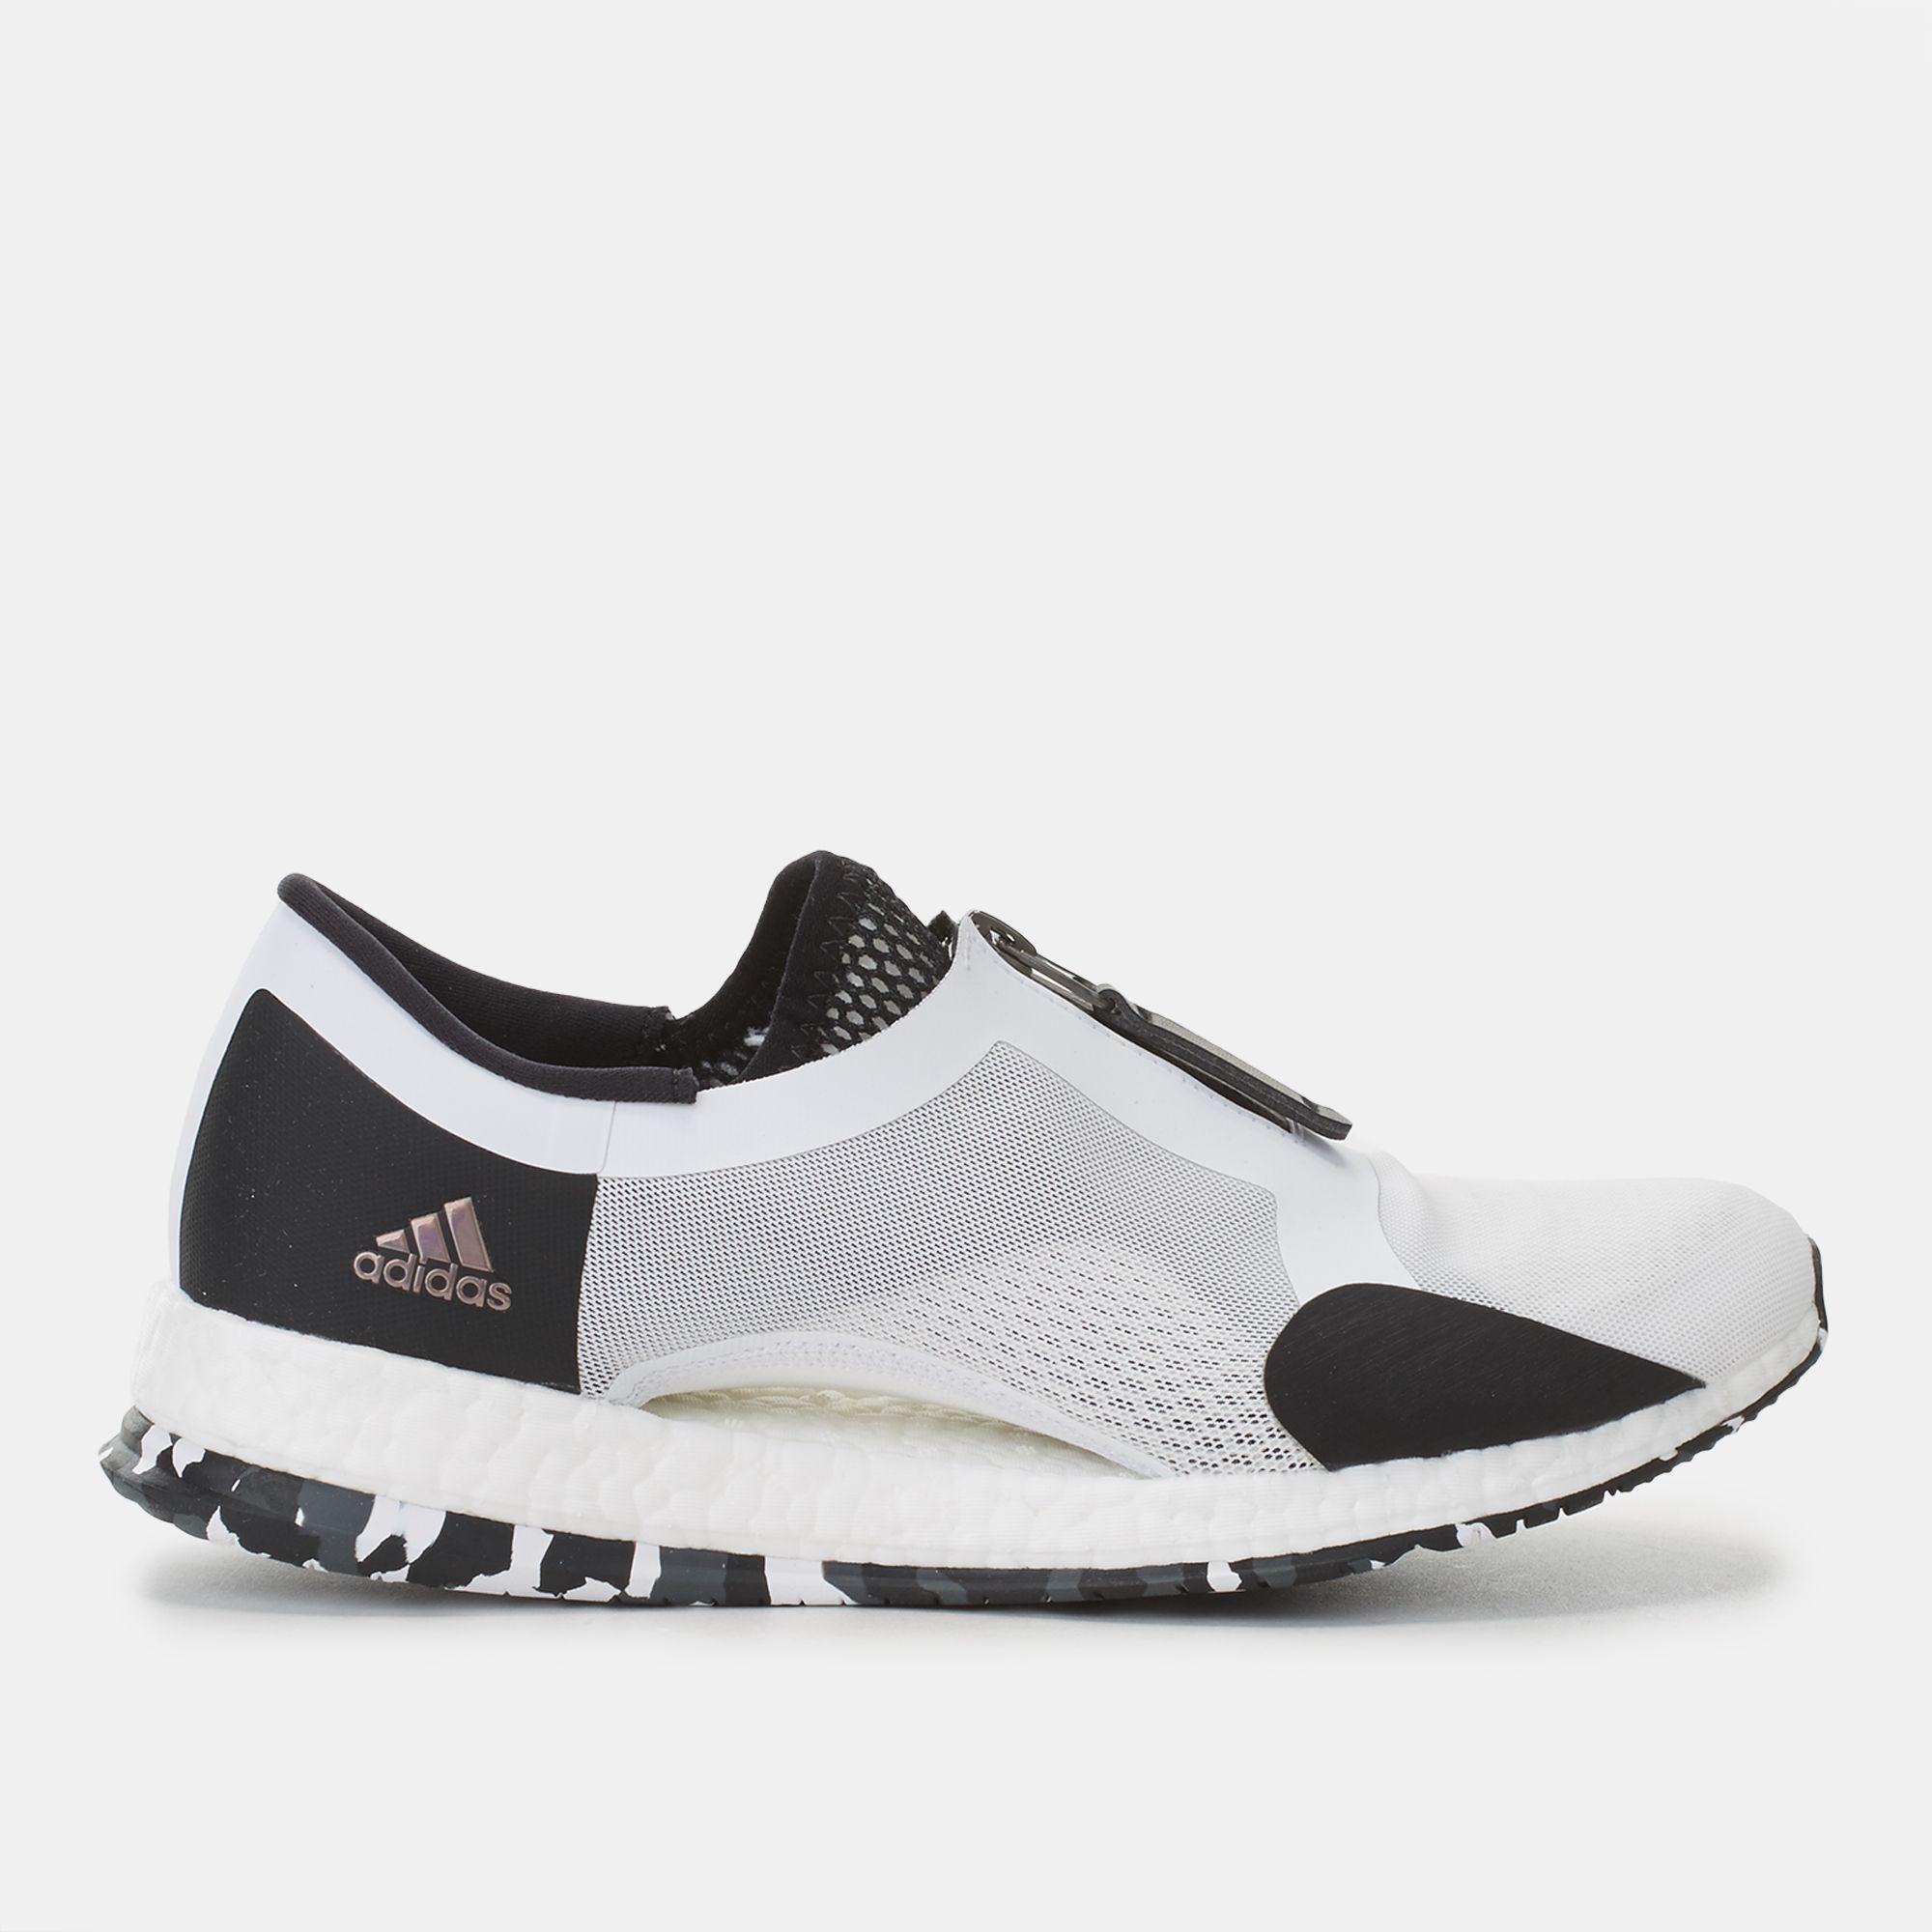 adidas PureBOOST X Trainer Zip Shoe